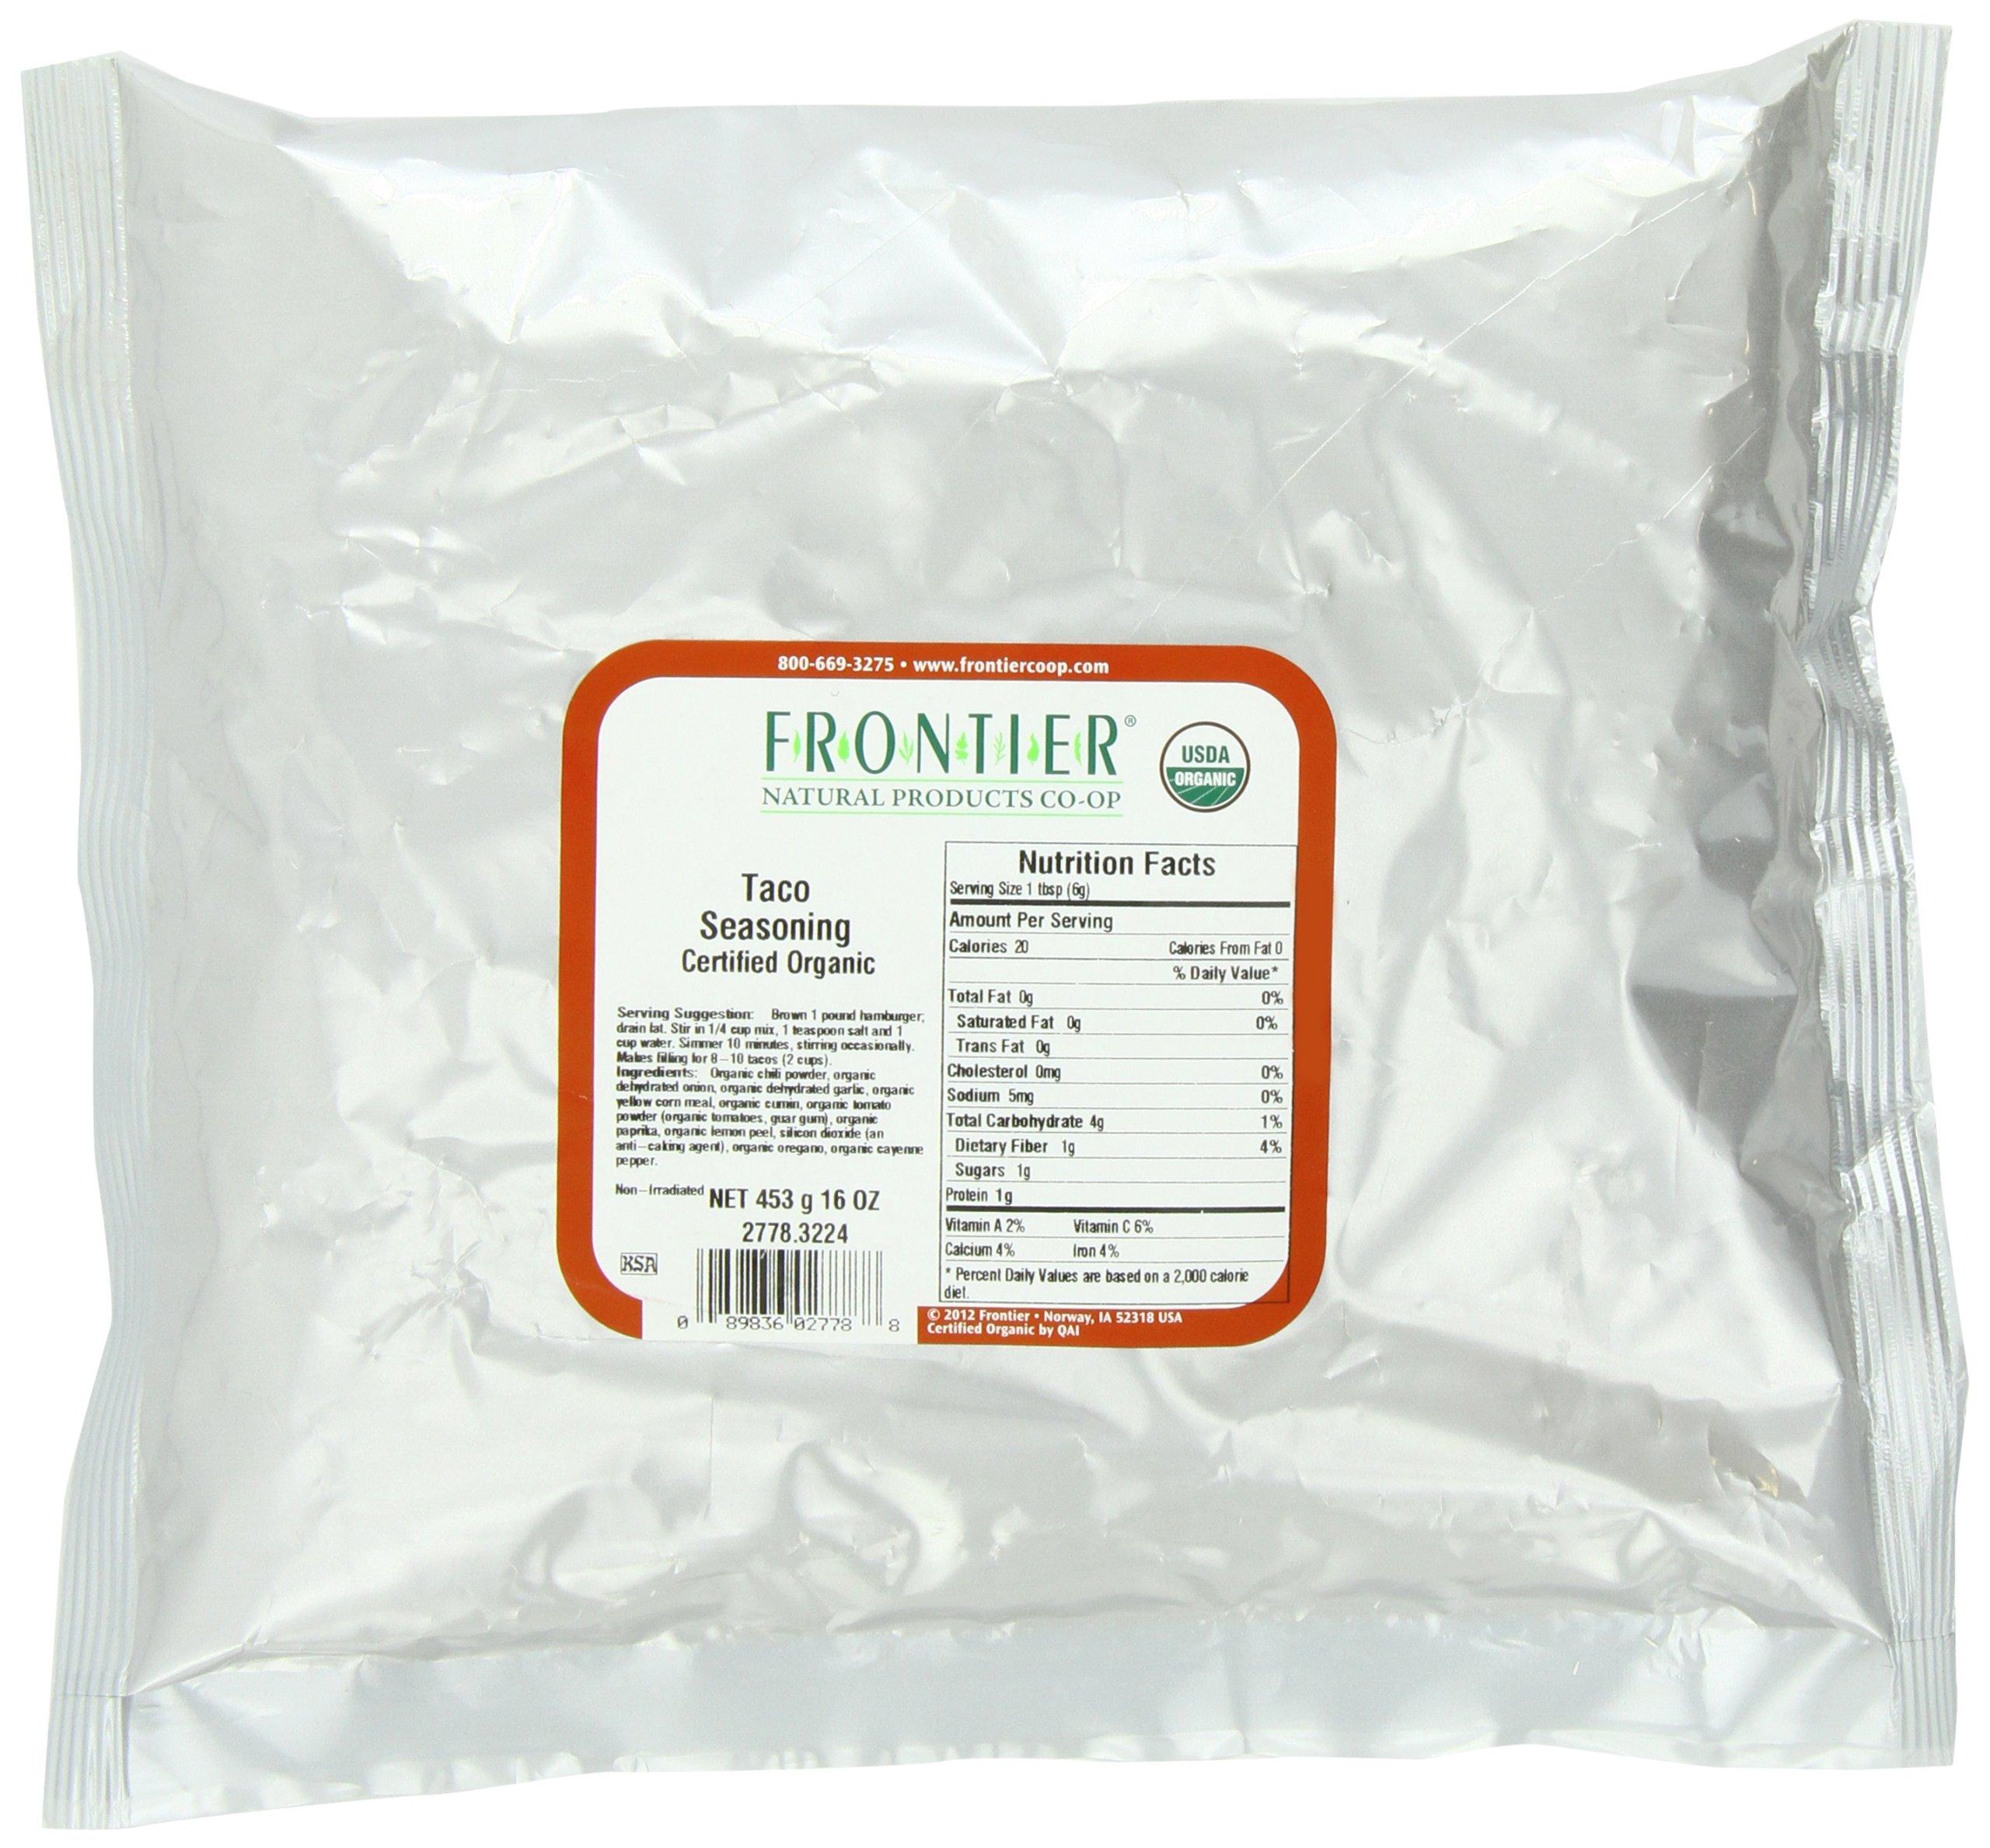 Frontier Taco Seasoning Certified Organic, 16 Ounce Bag